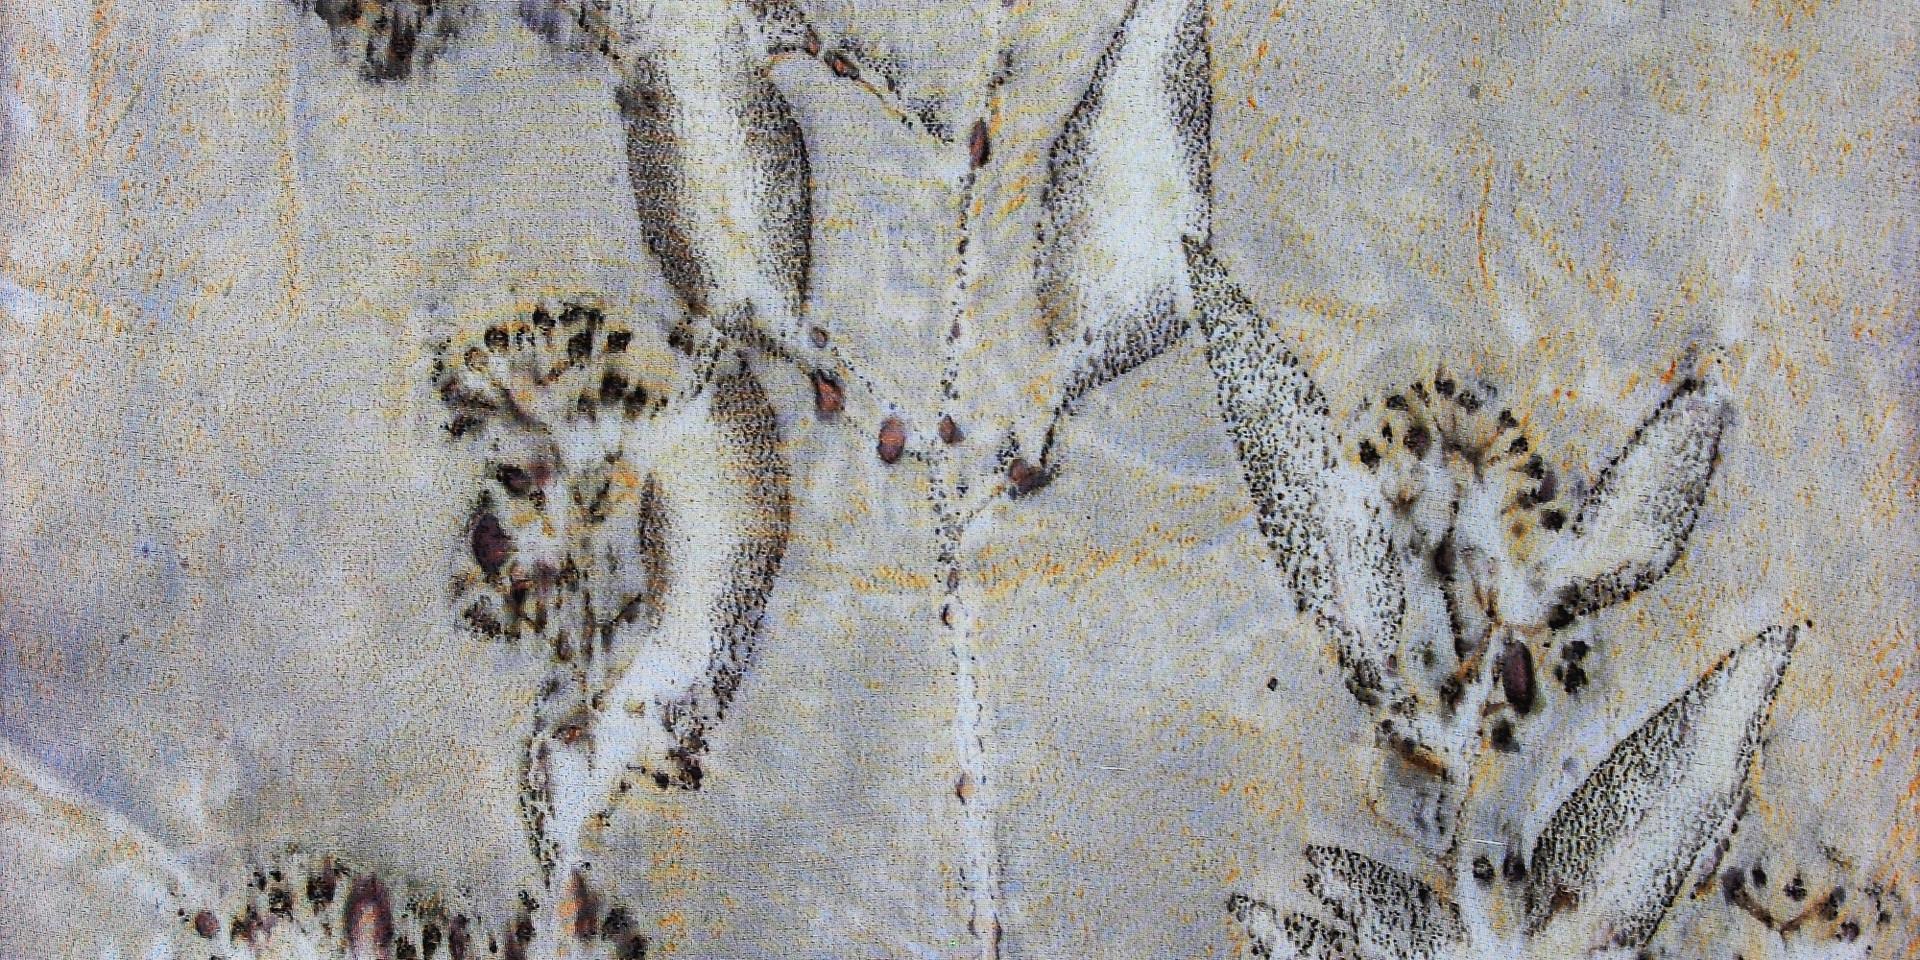 Detail of Seeded Eucalyptus